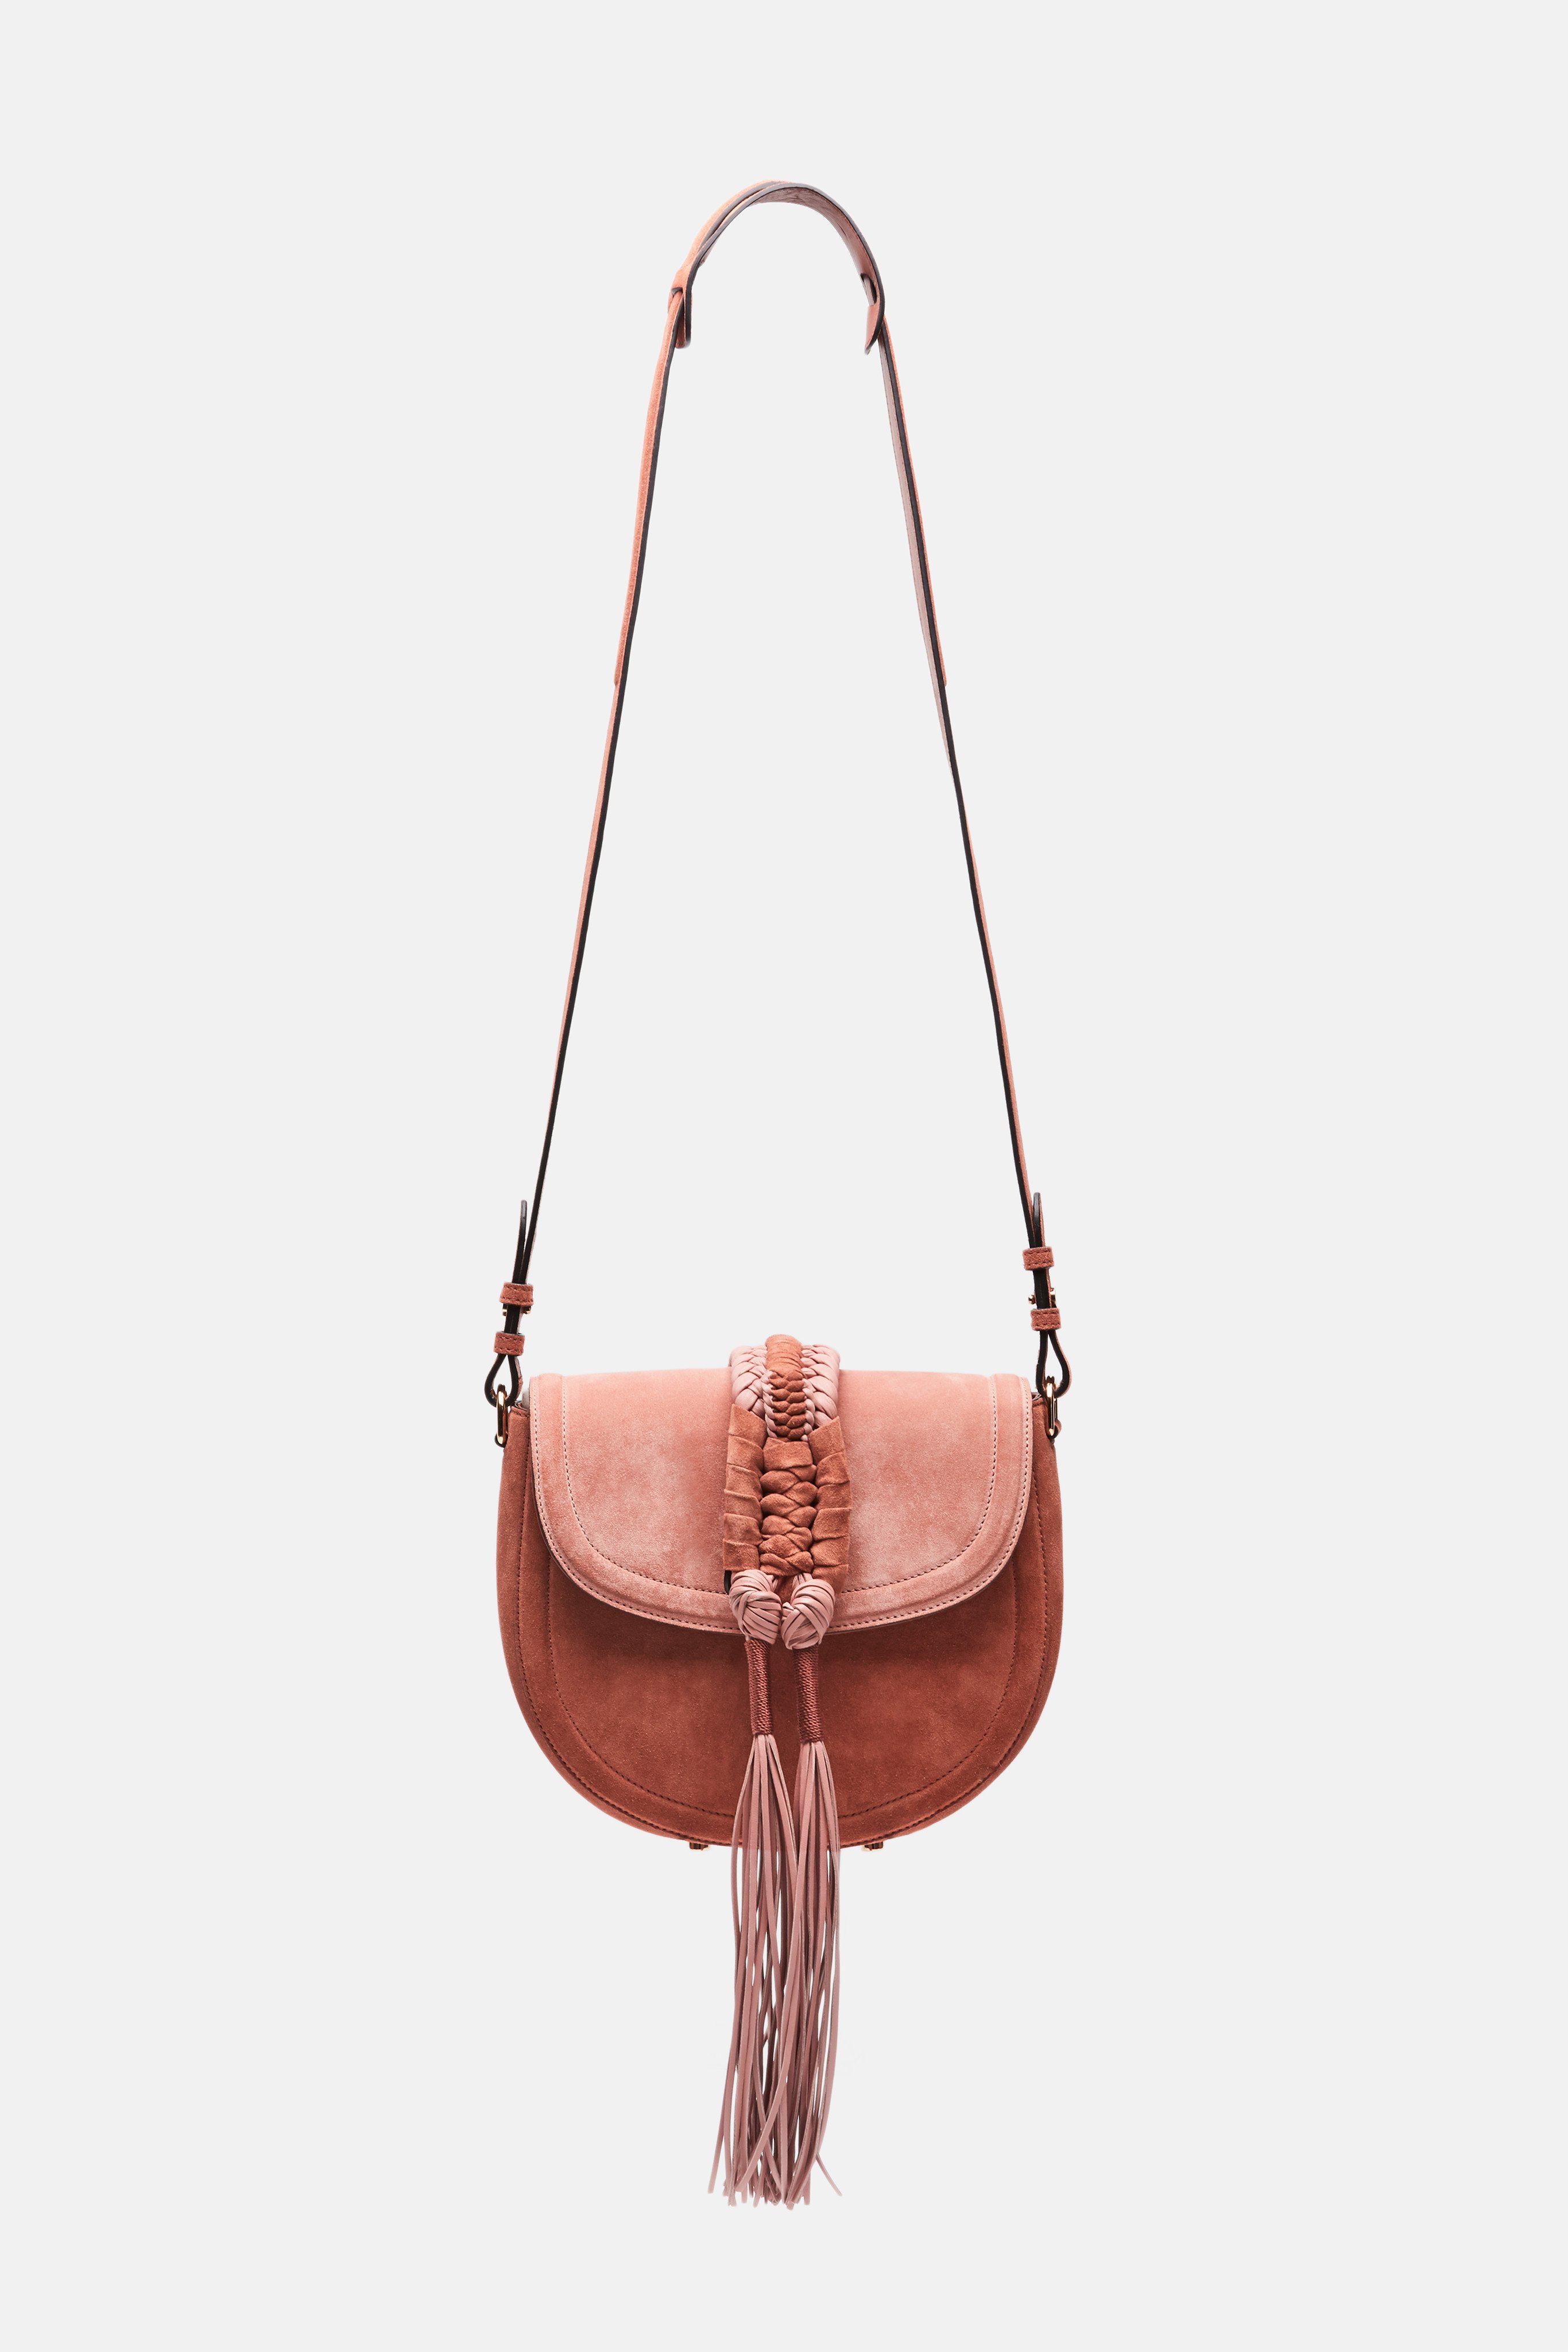 Lyst - Altuzarra Ghianda Knot Saddle Bag Small 9e32b57831ed7